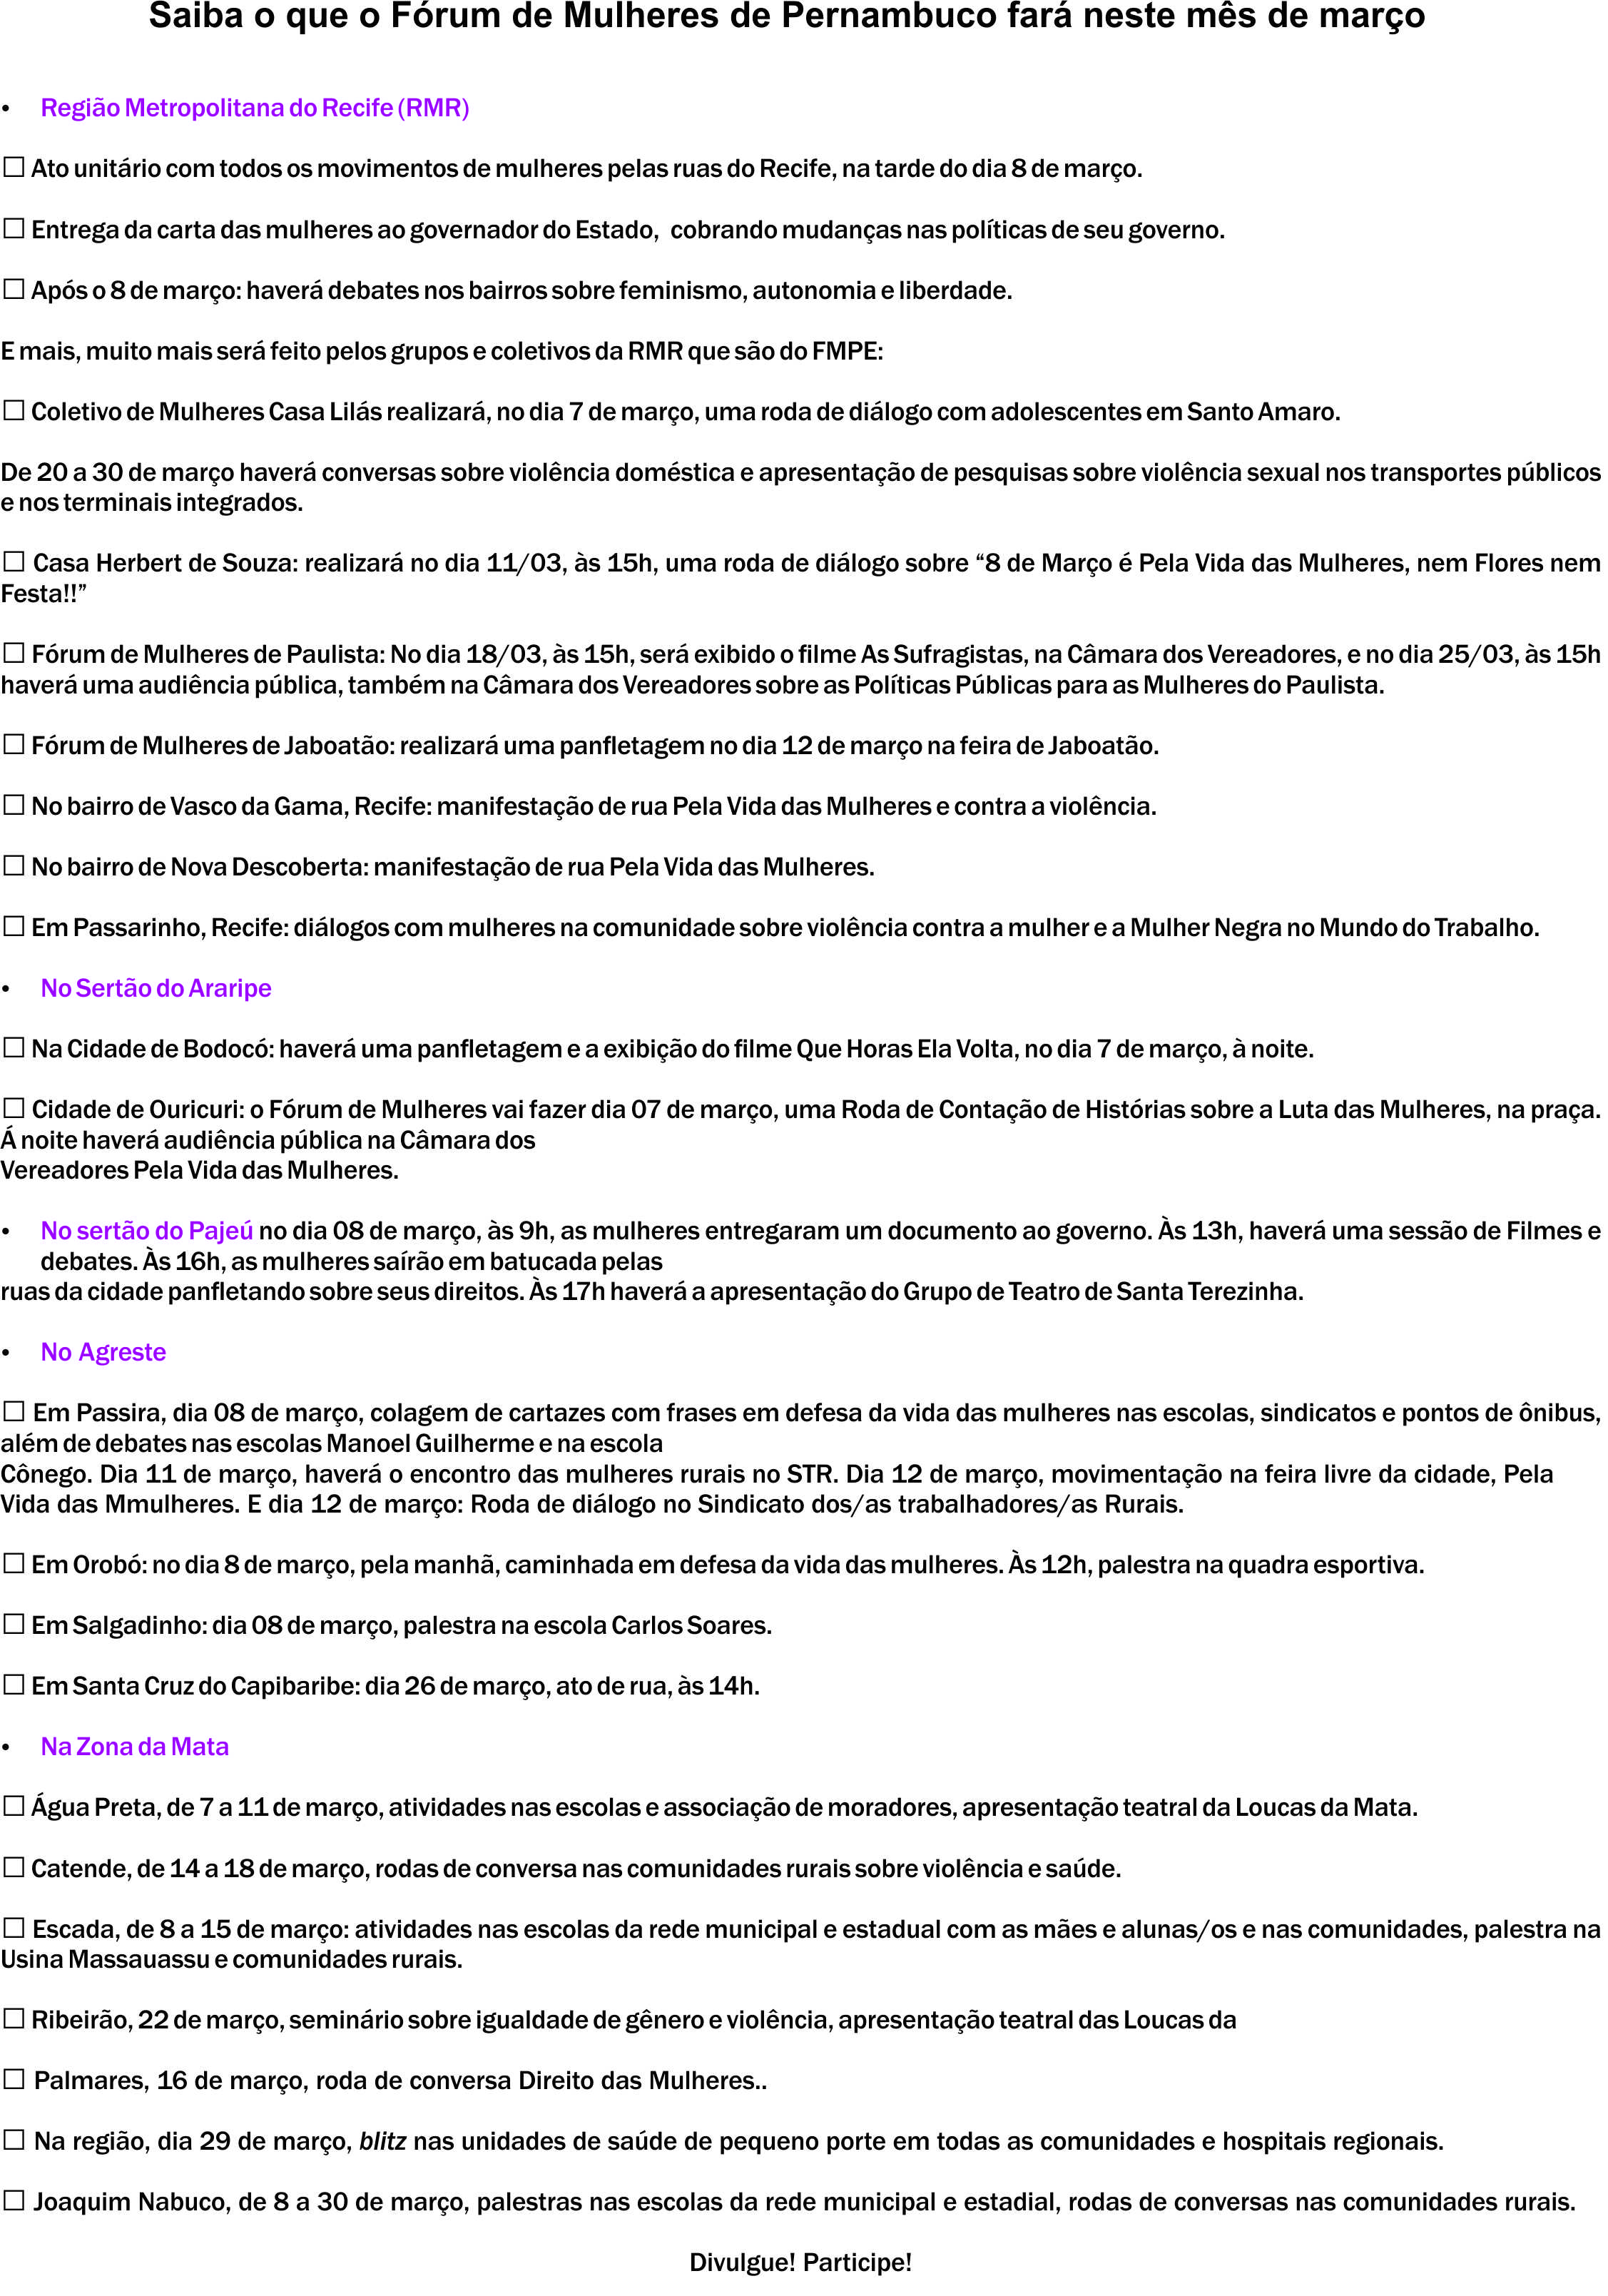 panfleto fmpe 8mar16_p2